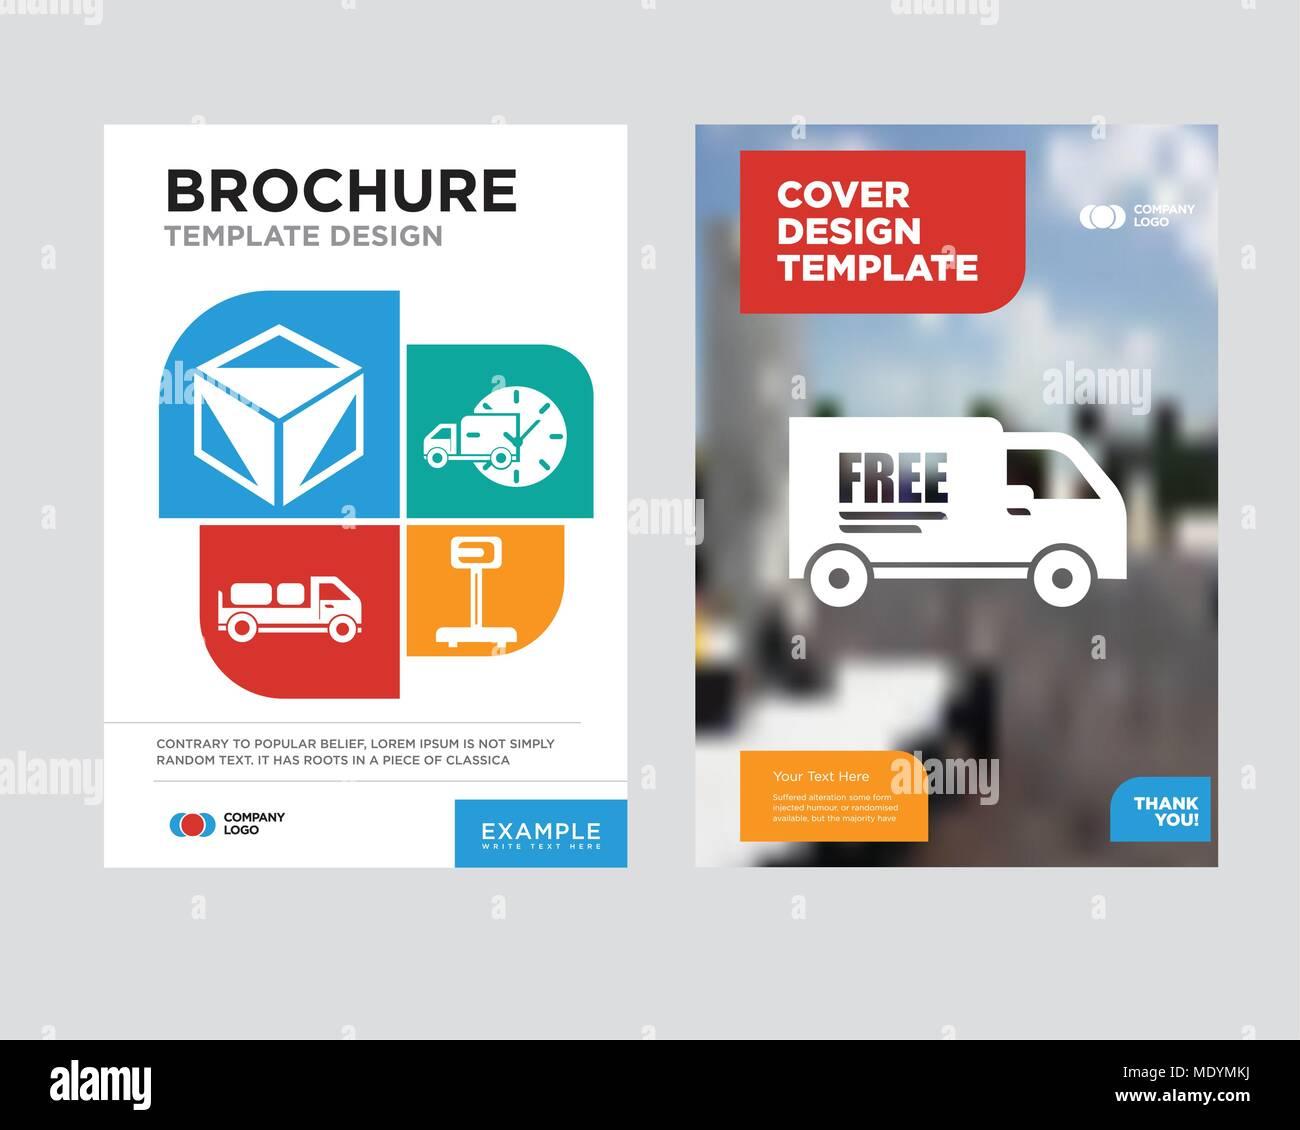 flyer design example